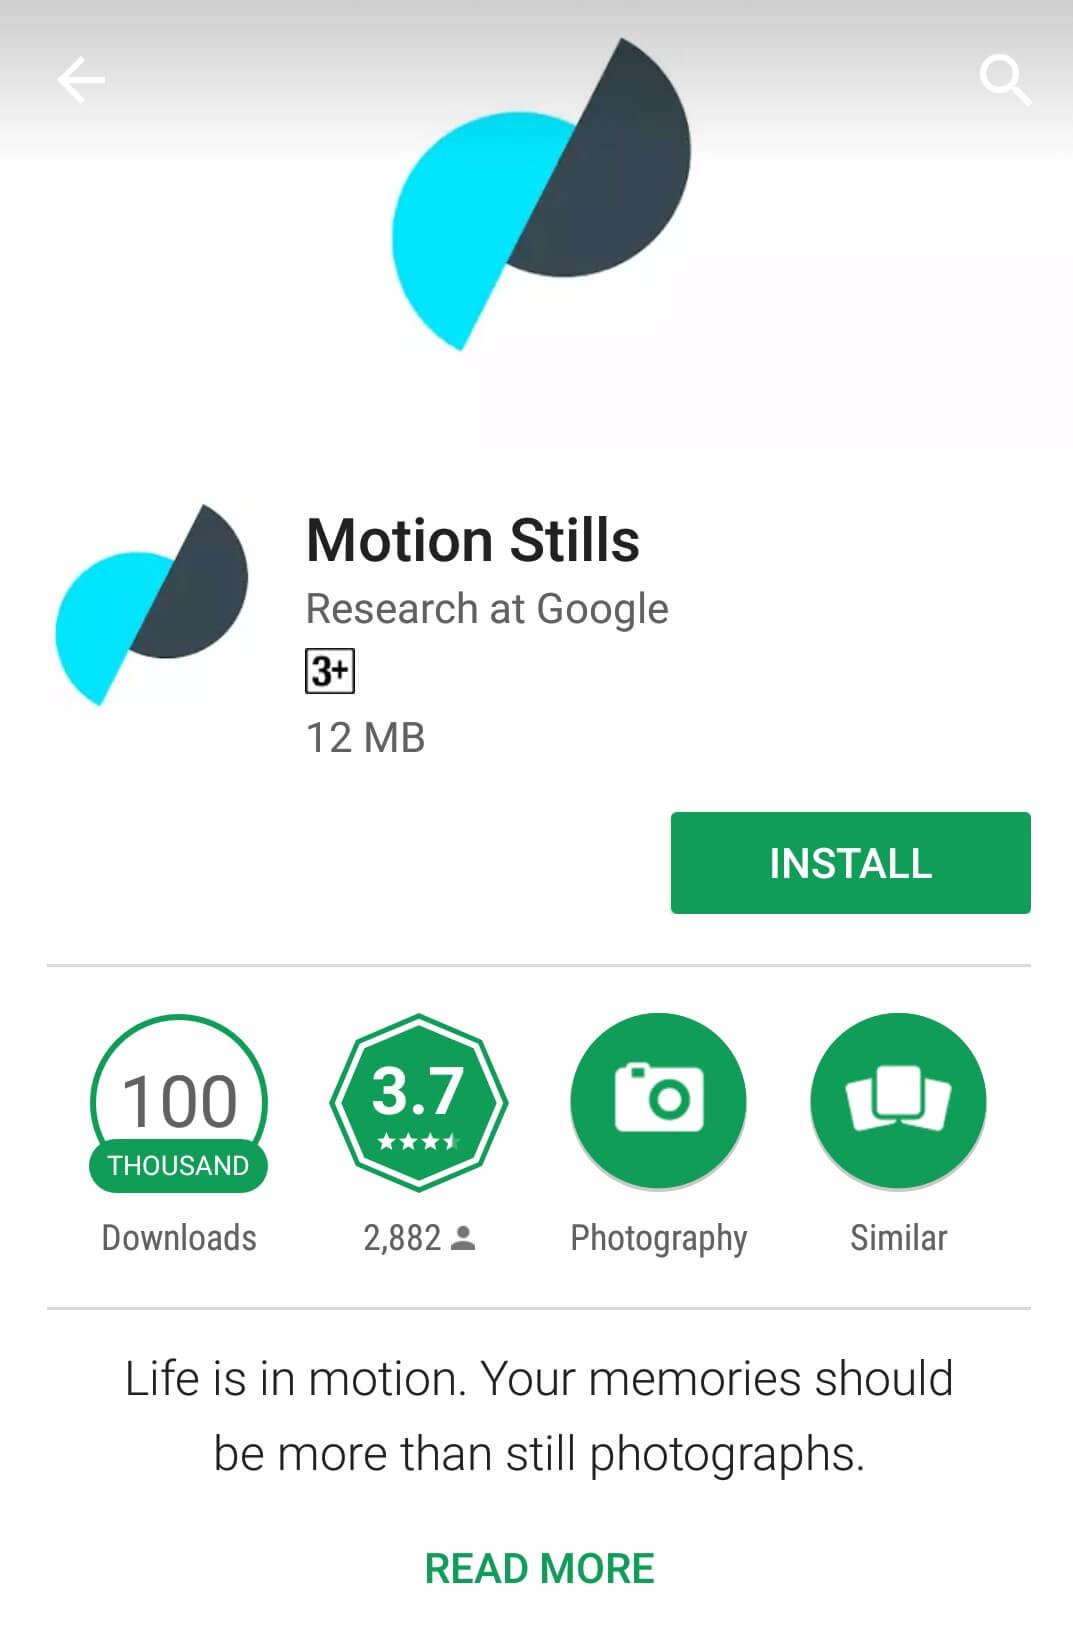 motion skills